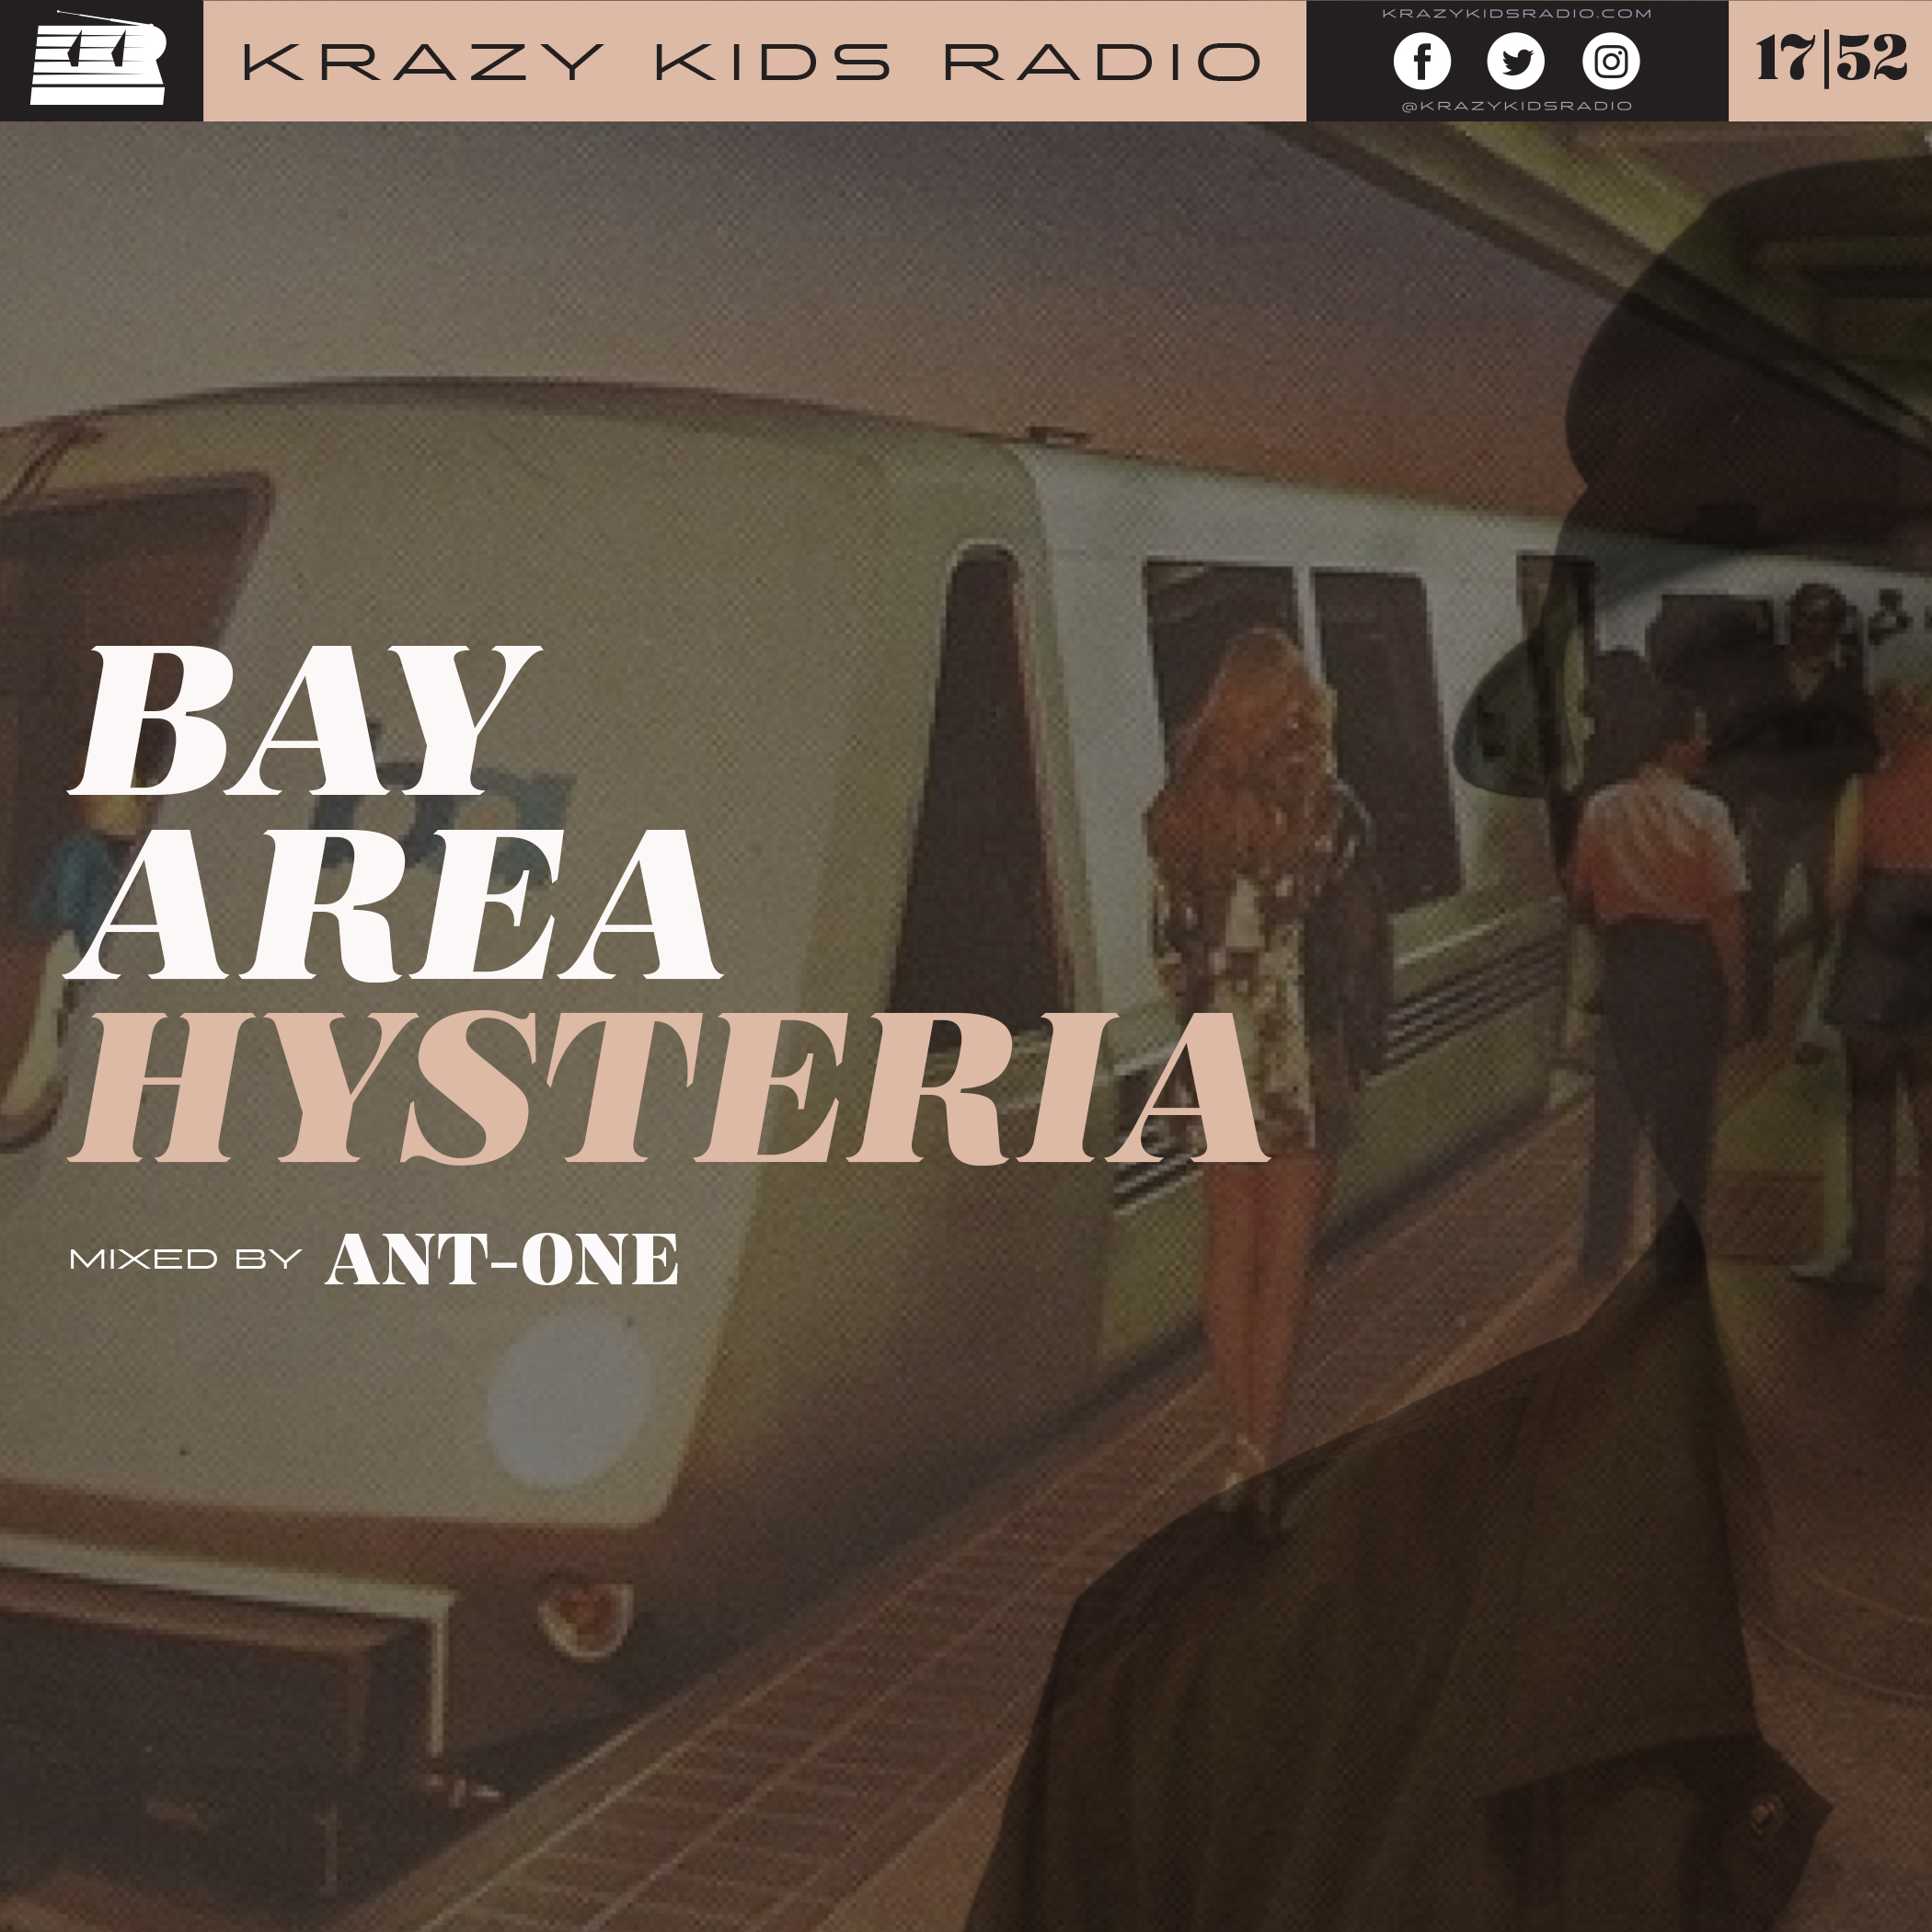 KKR_BAY-AREA-HYSTERIA.jpg